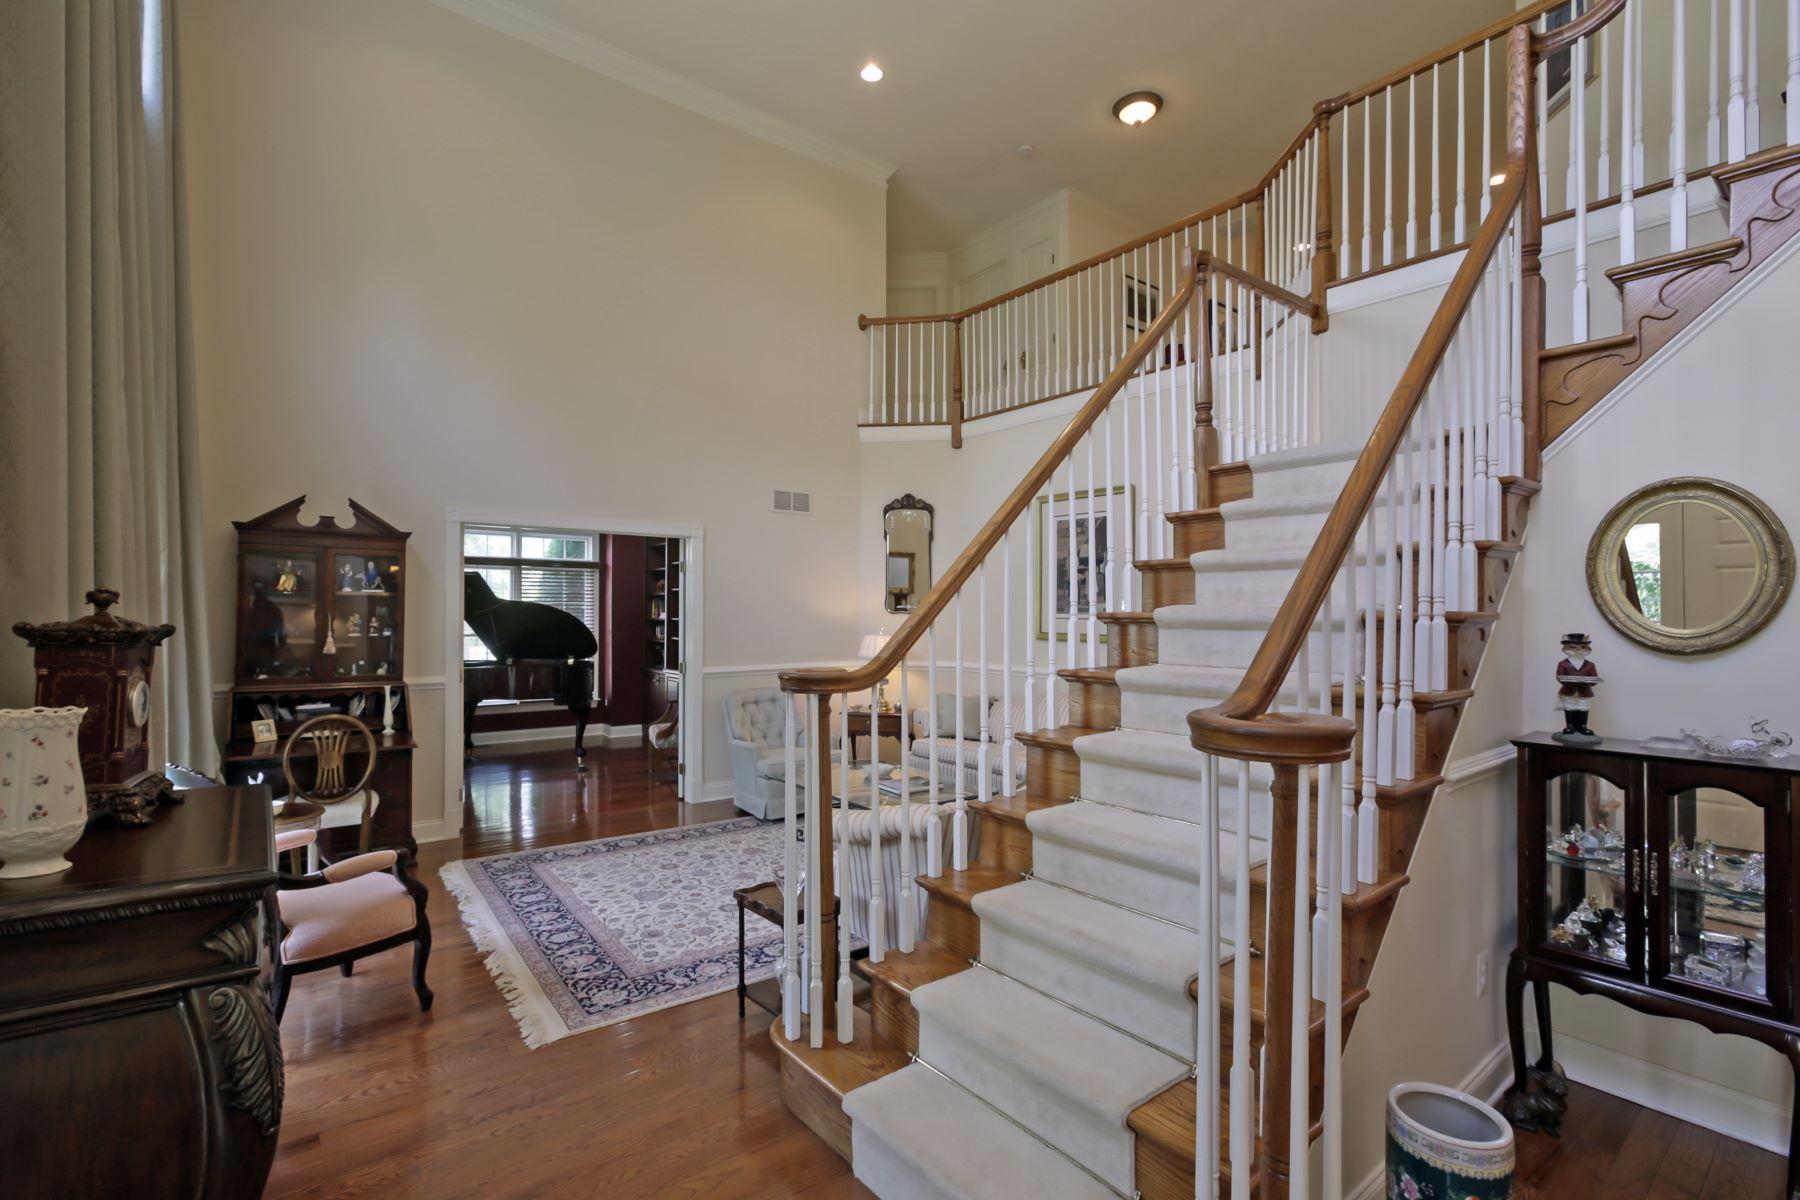 Residência urbana para Venda às Elegant Carriage Style Townhome 1504 Farley Road Tewksbury Township, Nova Jersey, 08889 Estados Unidos